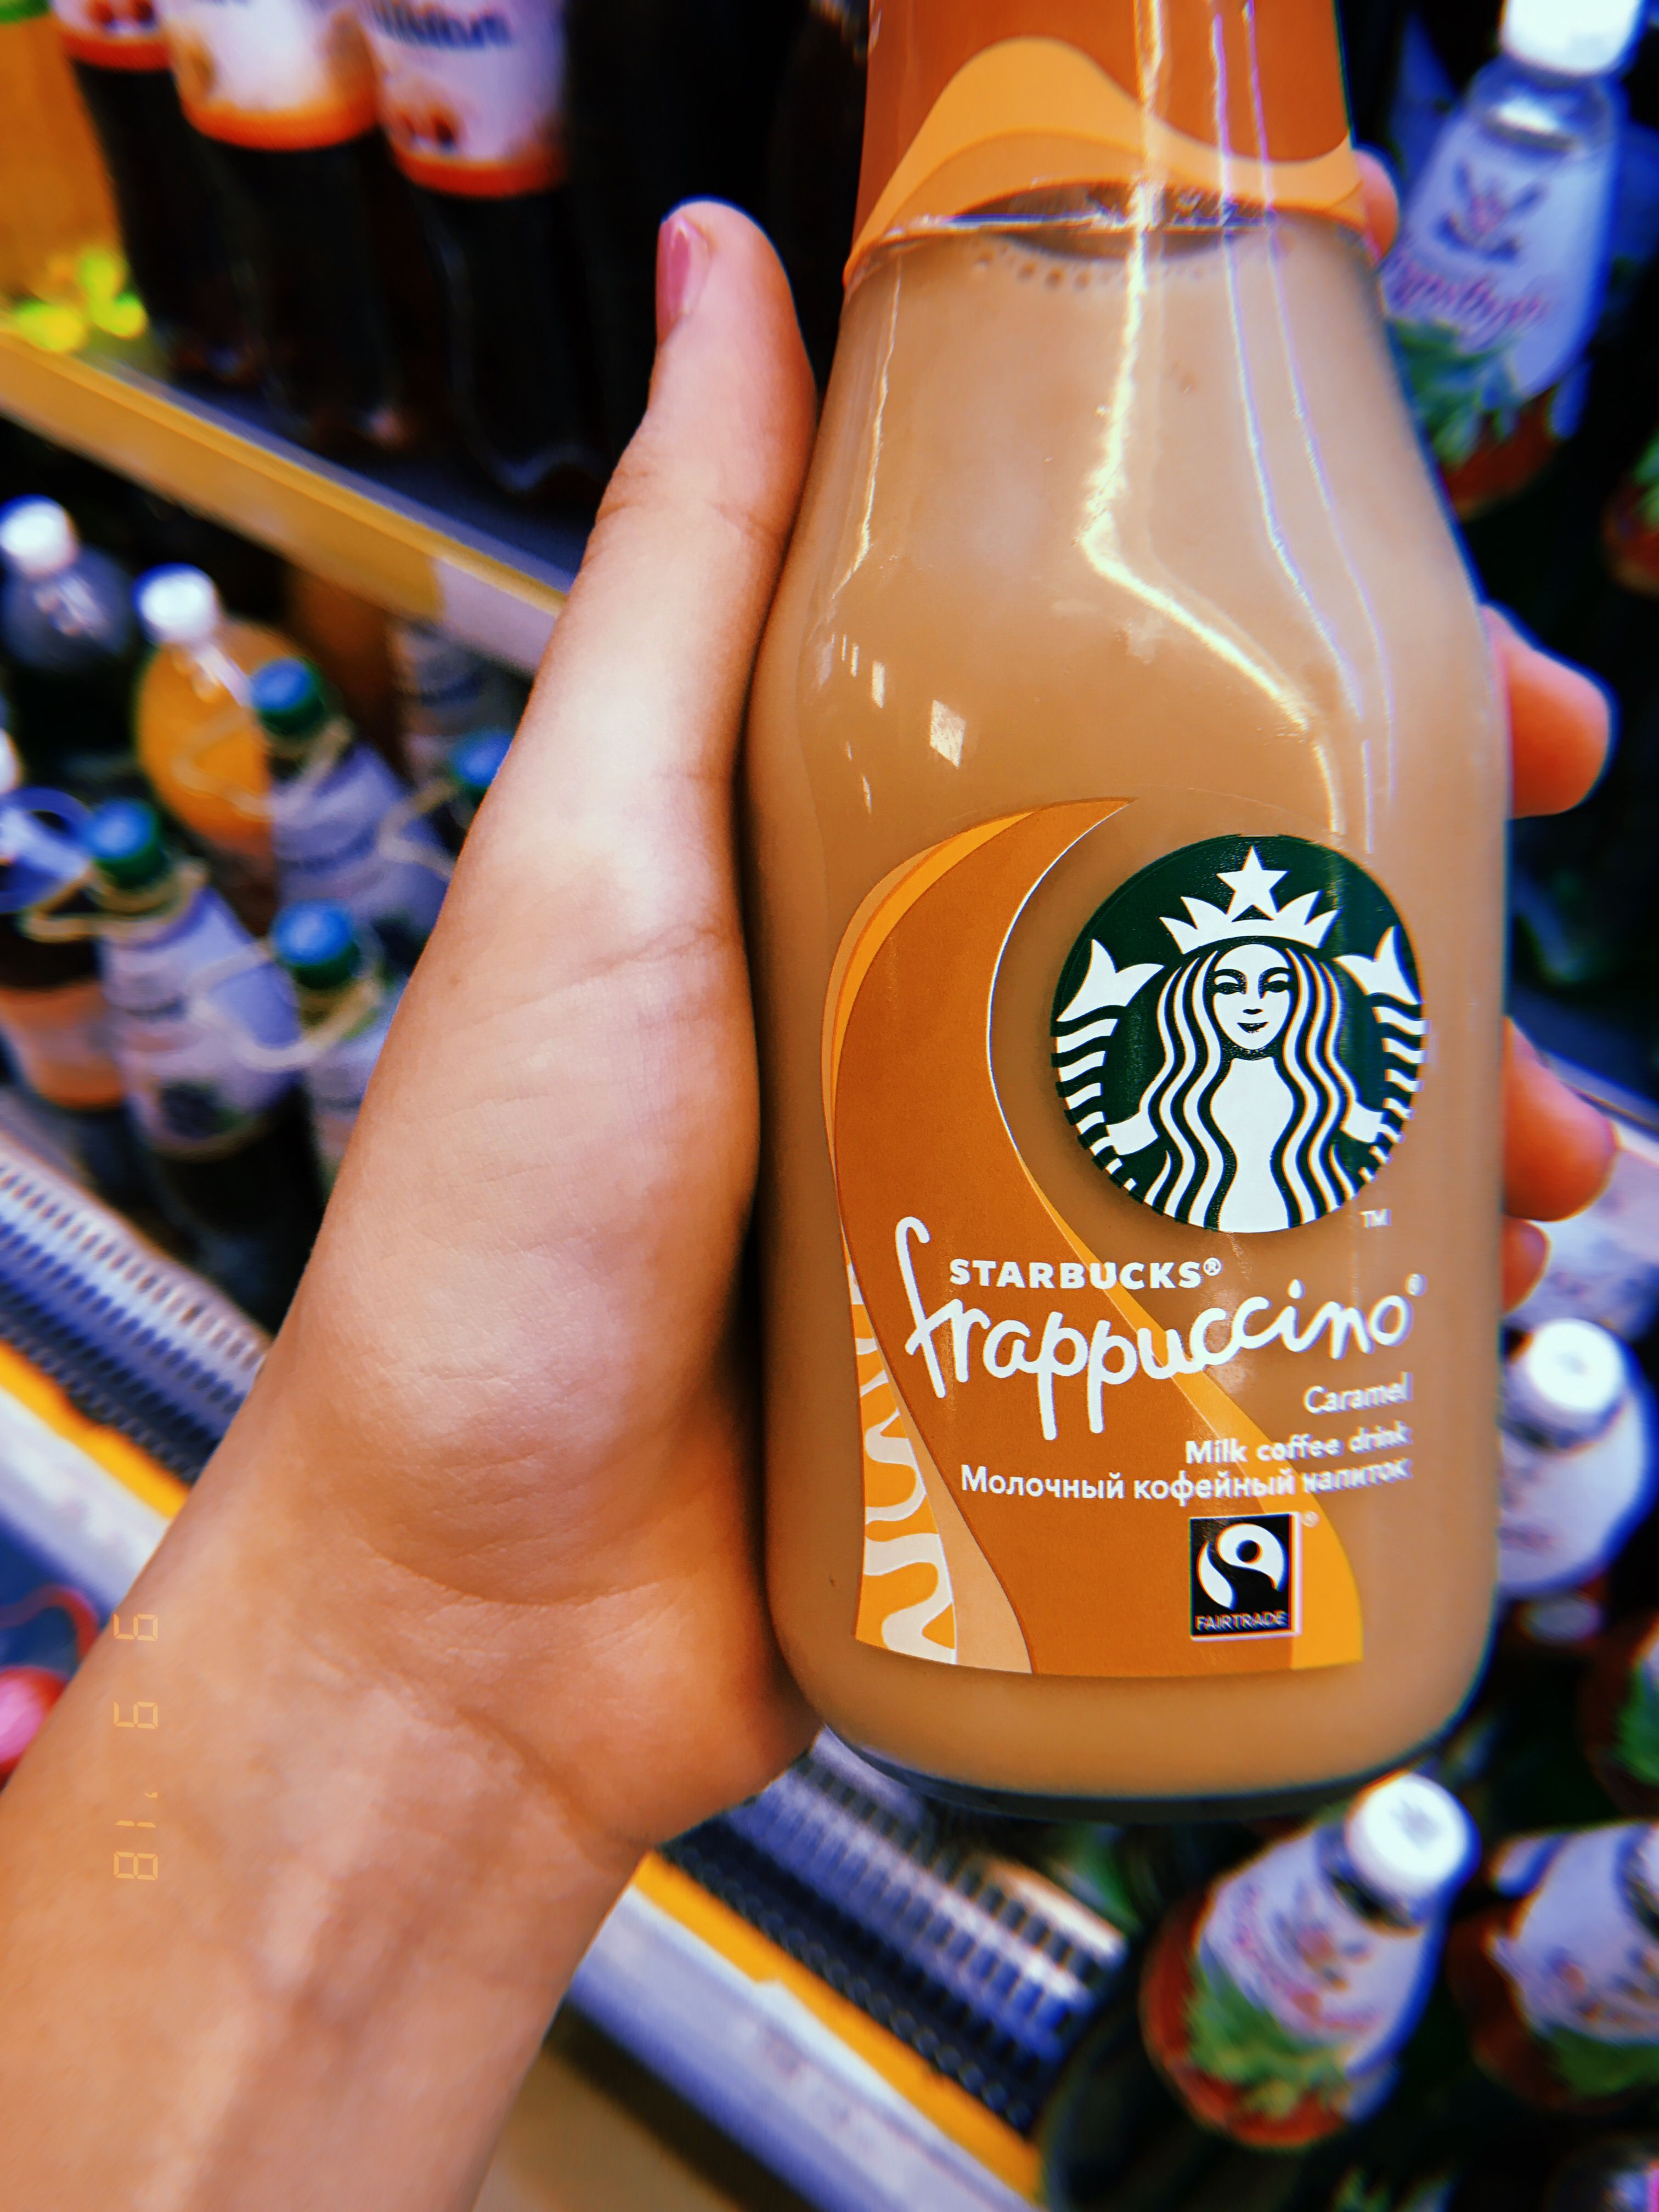 starbucks coffee bottled frappuccino